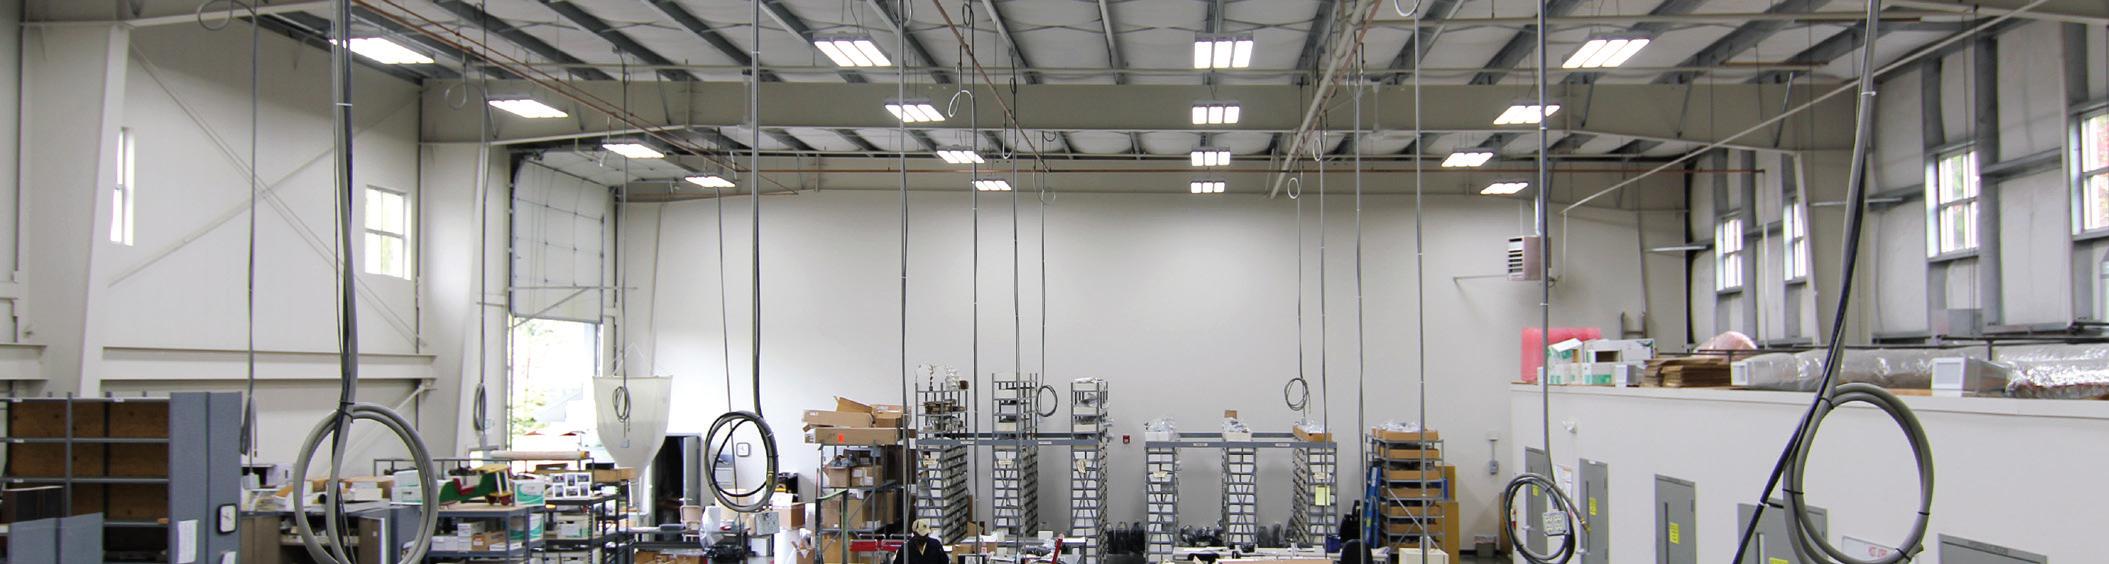 projecteur-IBL-eclairage-industriel